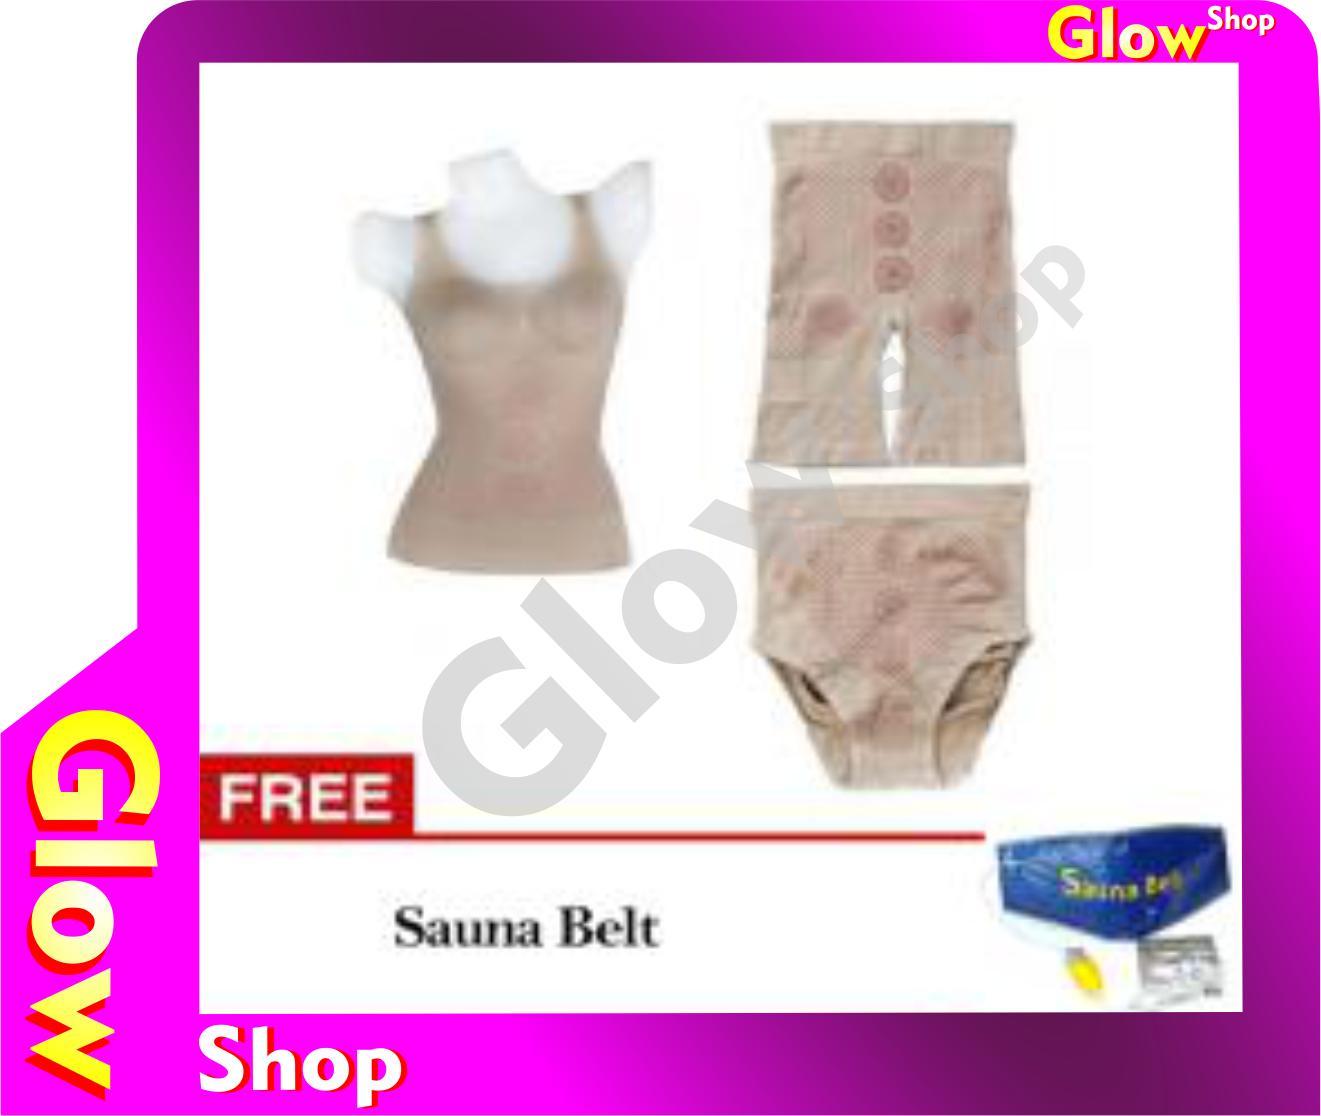 Glow shop - Monalisa Slimming Suit - Korset Pelangsing + Gratis Sauna Belt